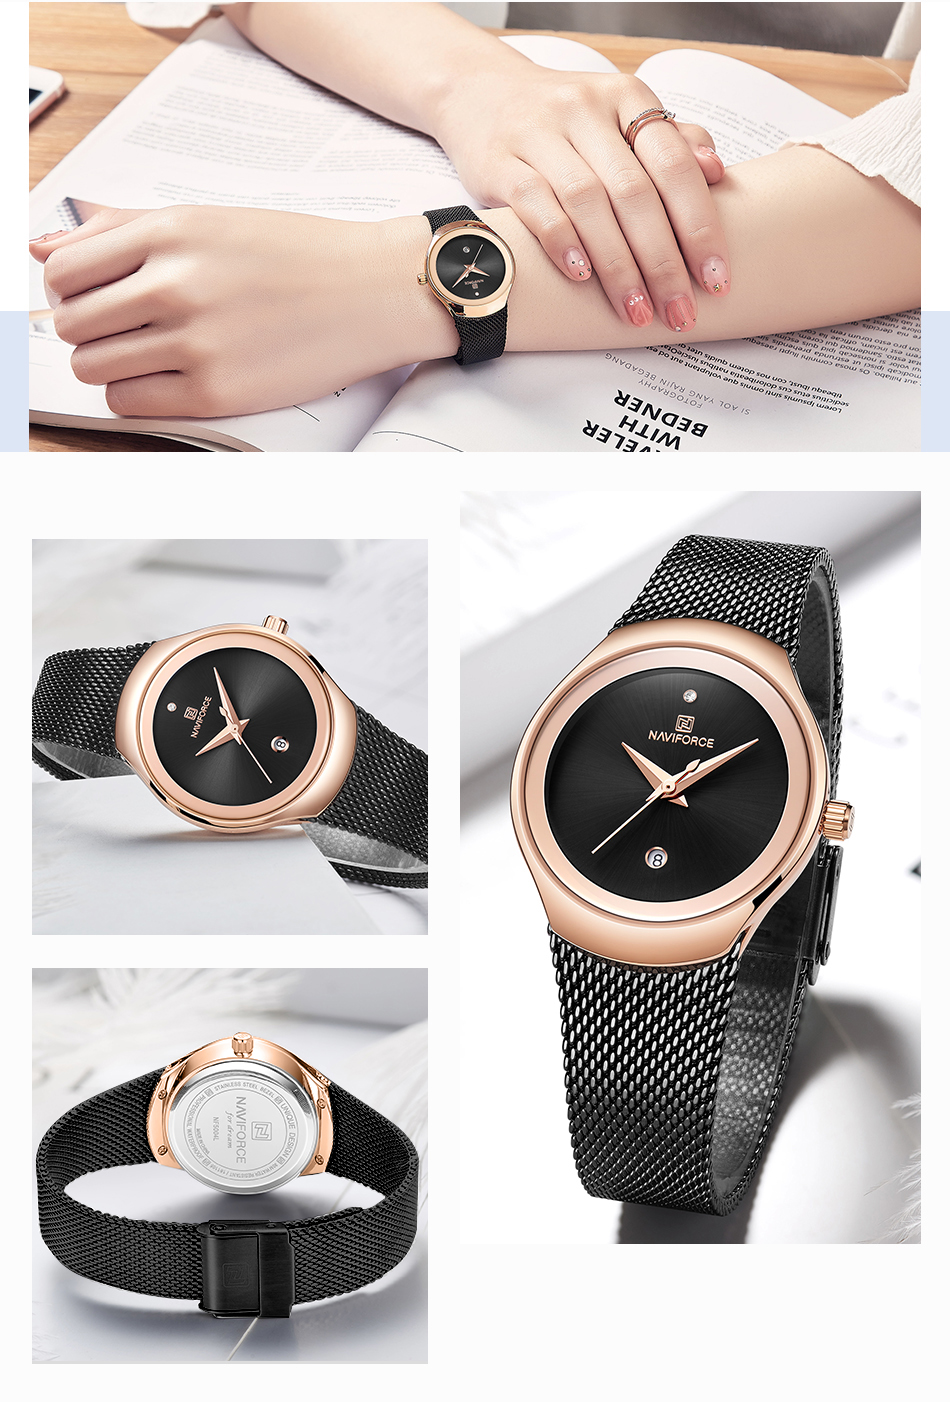 NAVIFORCE Women's Watches Fashion Girl Wristwatch Luxury Quartz Watch Women Stainless Steel Mesh Bracelet Clock Bayan Kol Saati (9)